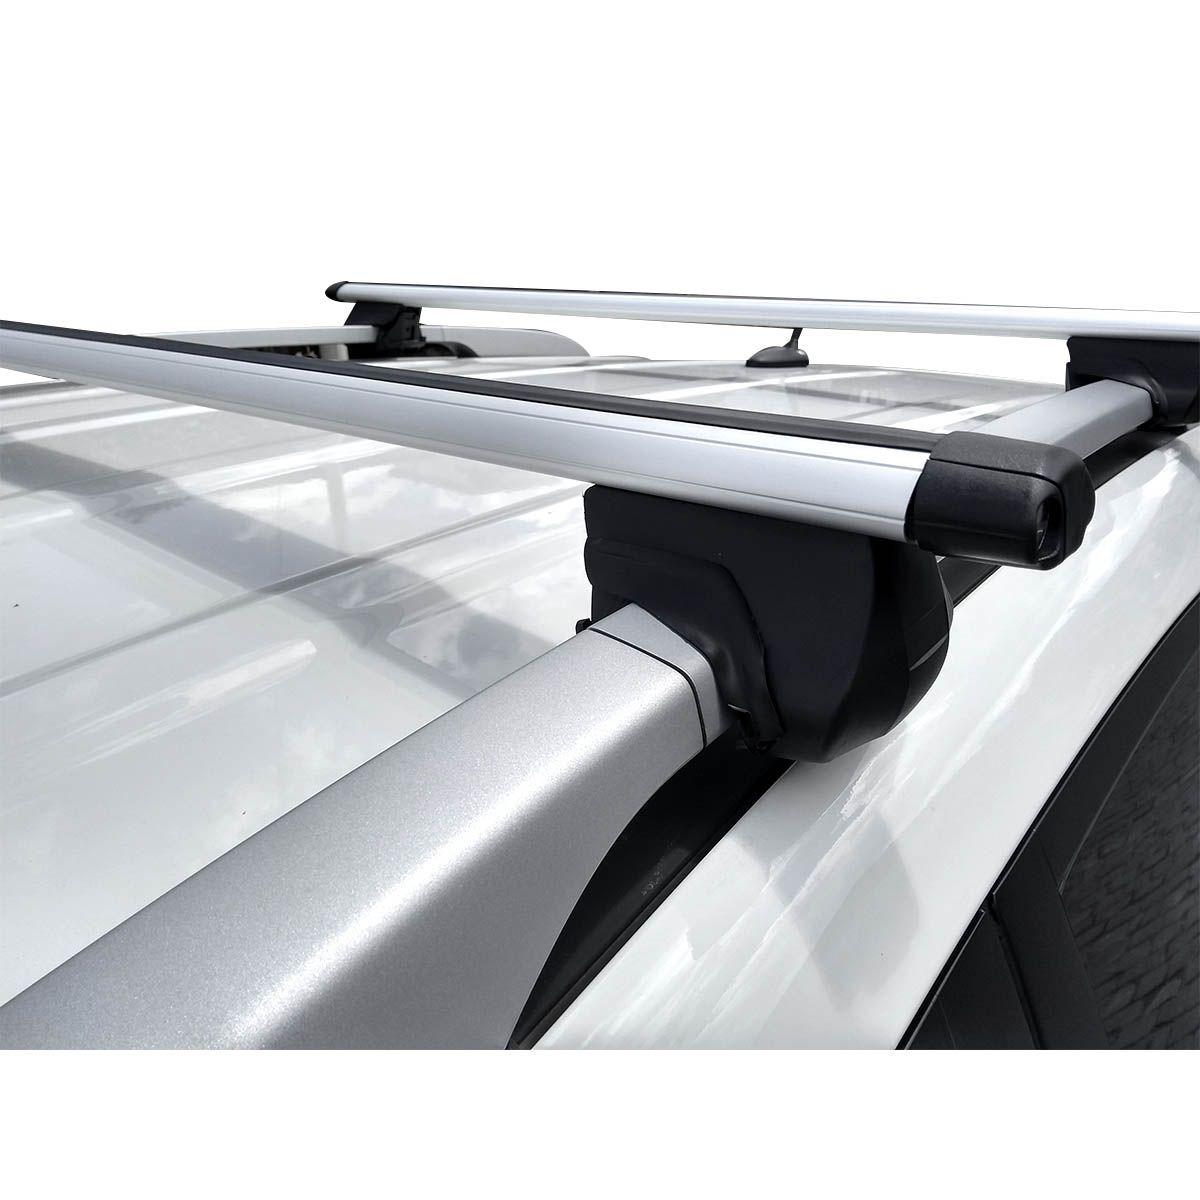 Travessa rack de teto larga com chave Jimny 2012 a 2018